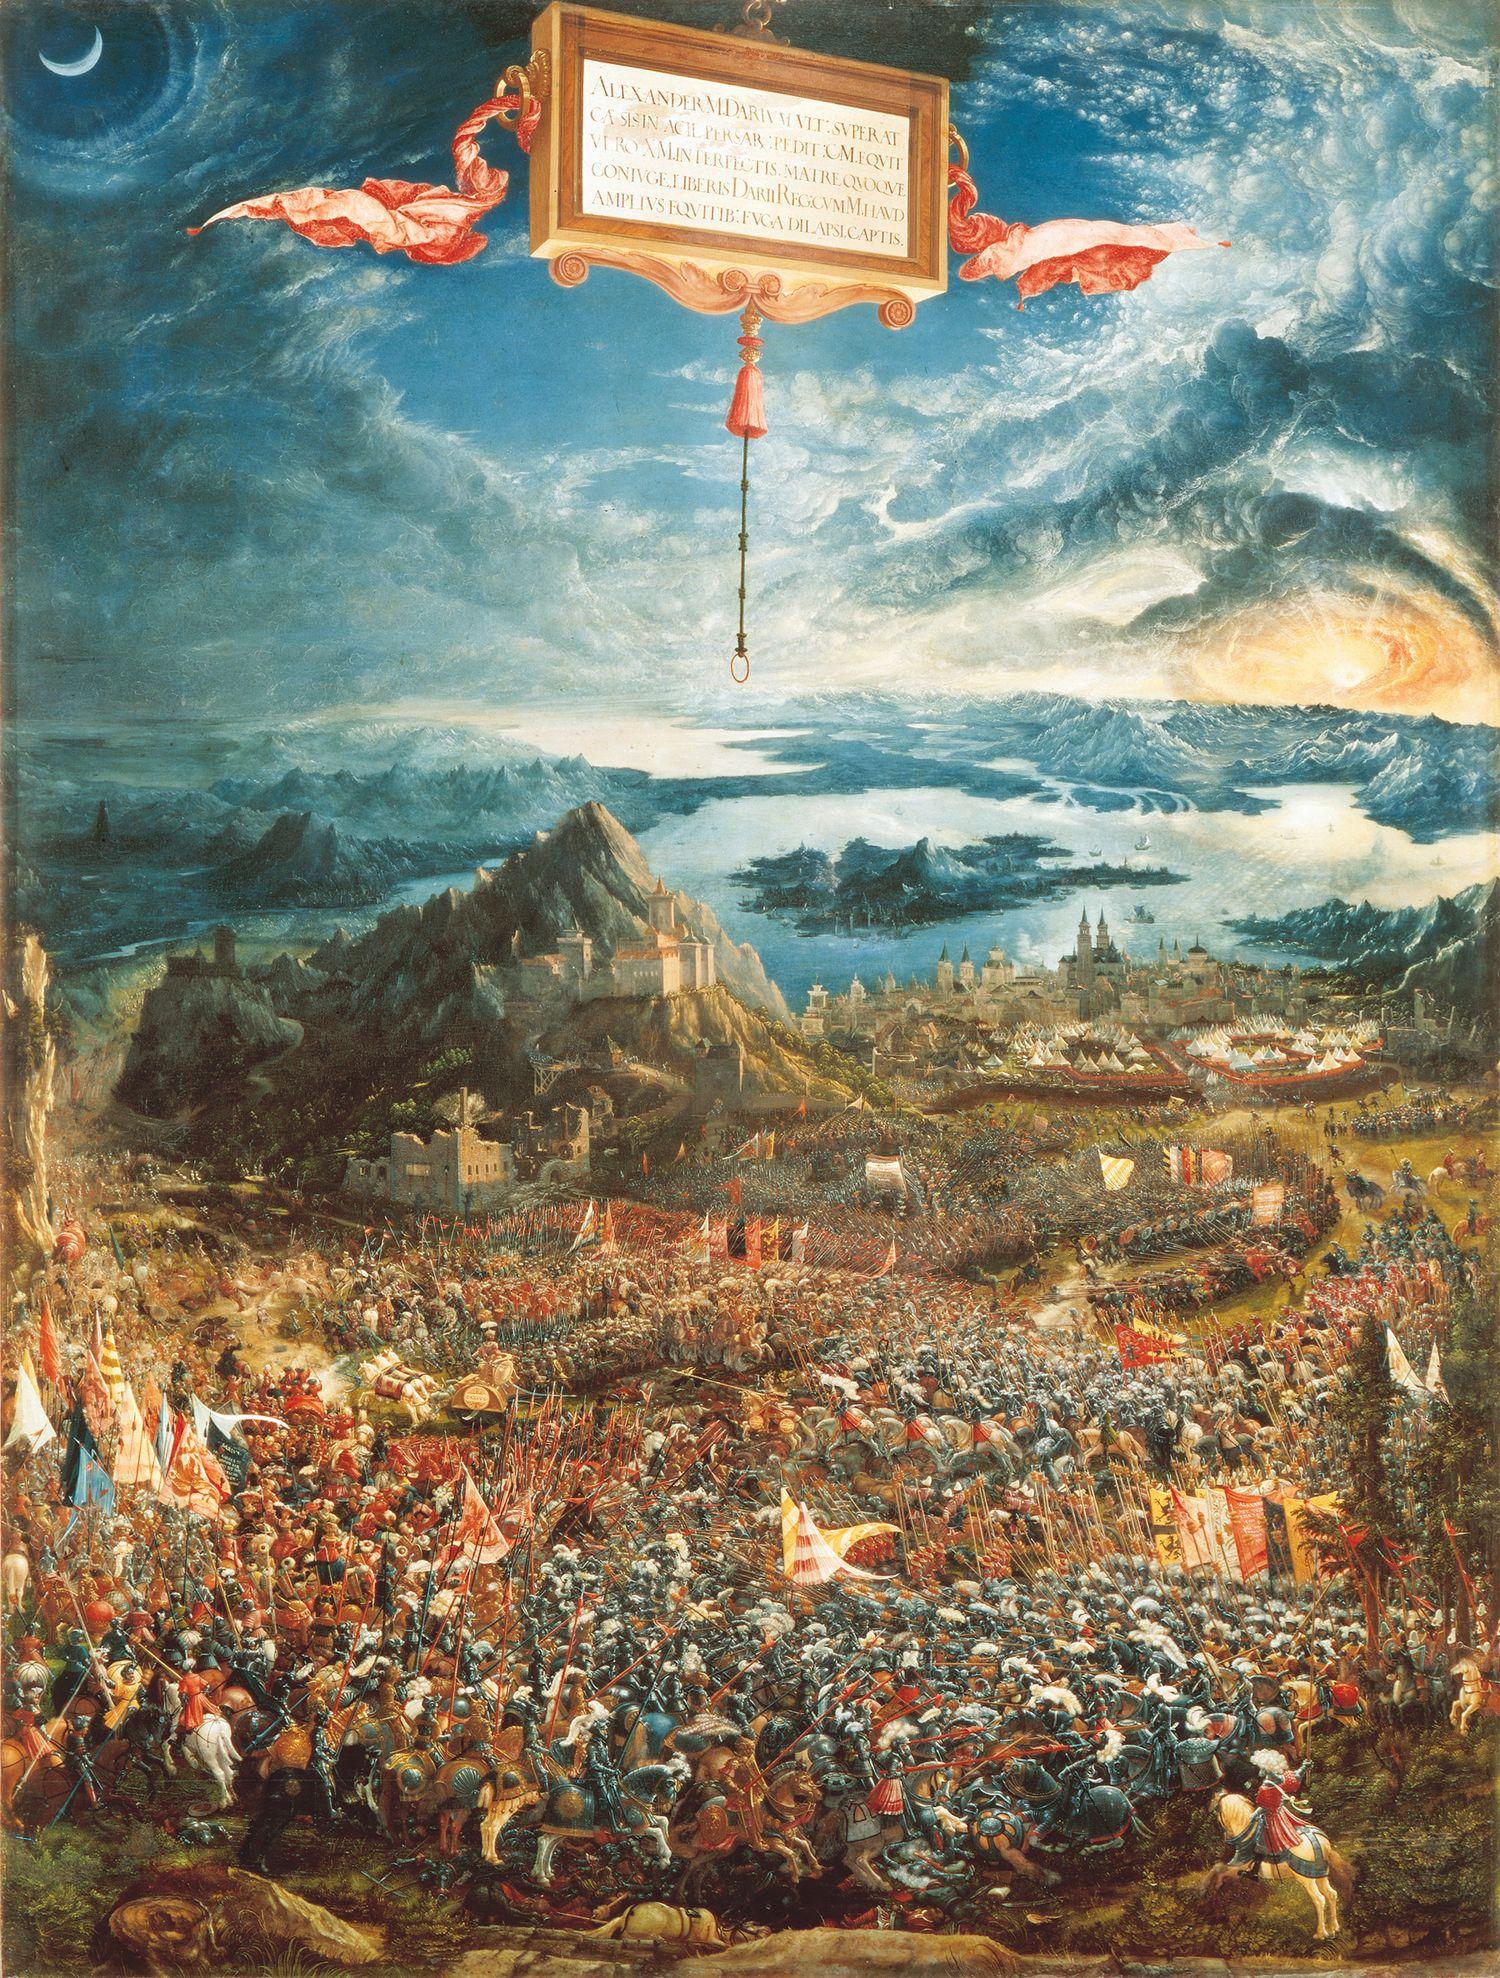 The Battle of Alexander at Issus,  AutorAlbrecht Altdorfer, 1528-1529 TécnicaÓleo sobre tabla EstiloRenacimiento Tamaño158,4 cm × 120,3 cm LocalizaciónAlte Pinakothek, Múnich, Alemania